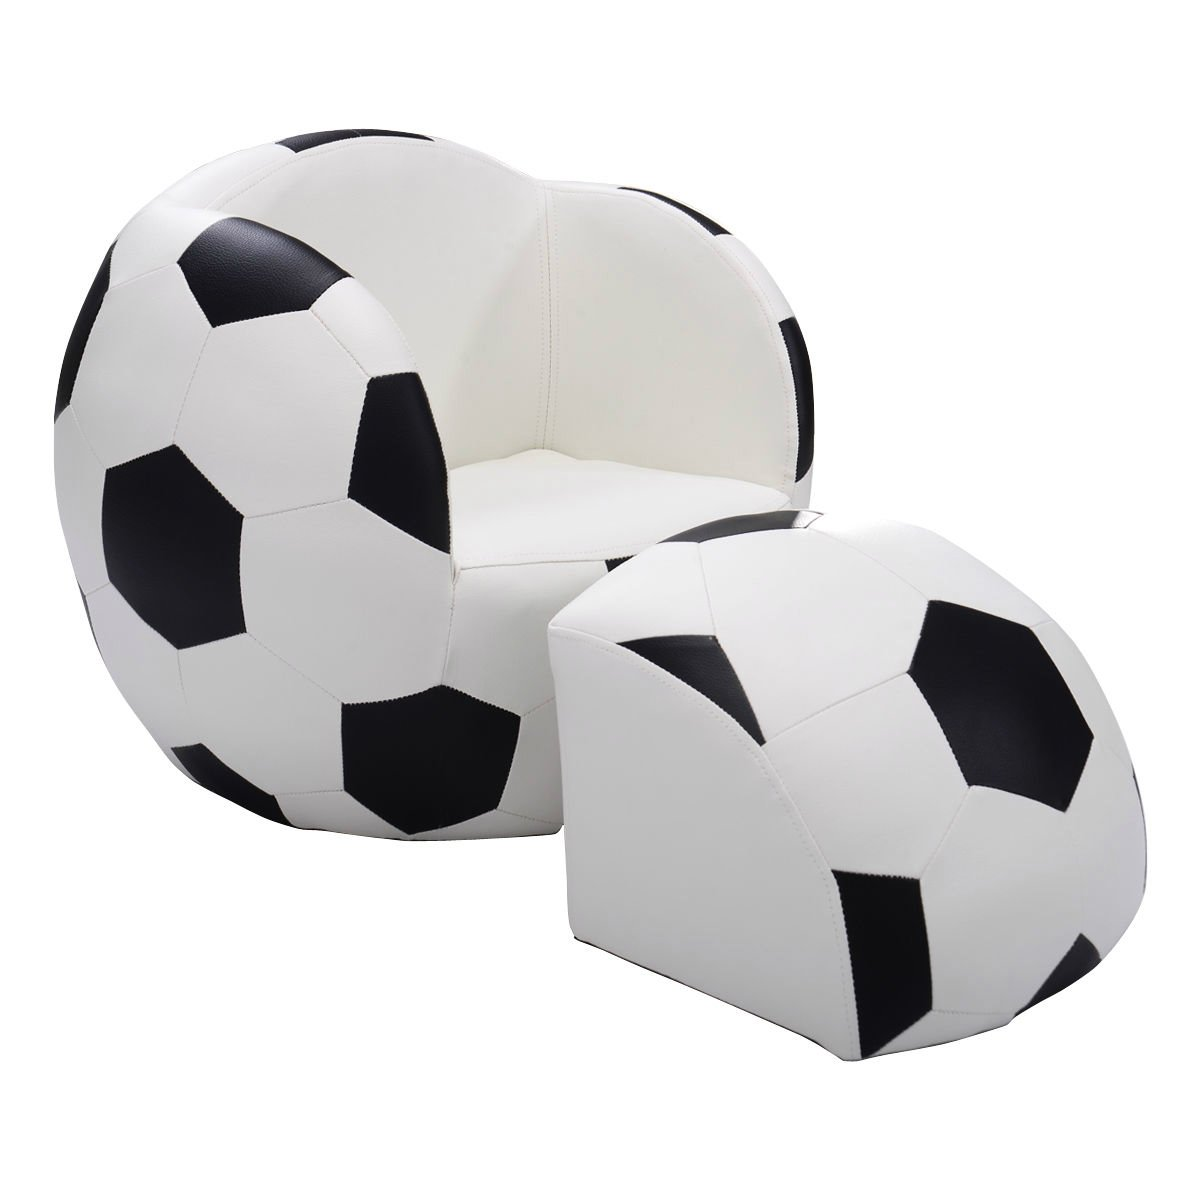 Children Soccer Ball Sofa with Ottoman Fun Multi-functional Sofa Kids Room Bedroom Playroom